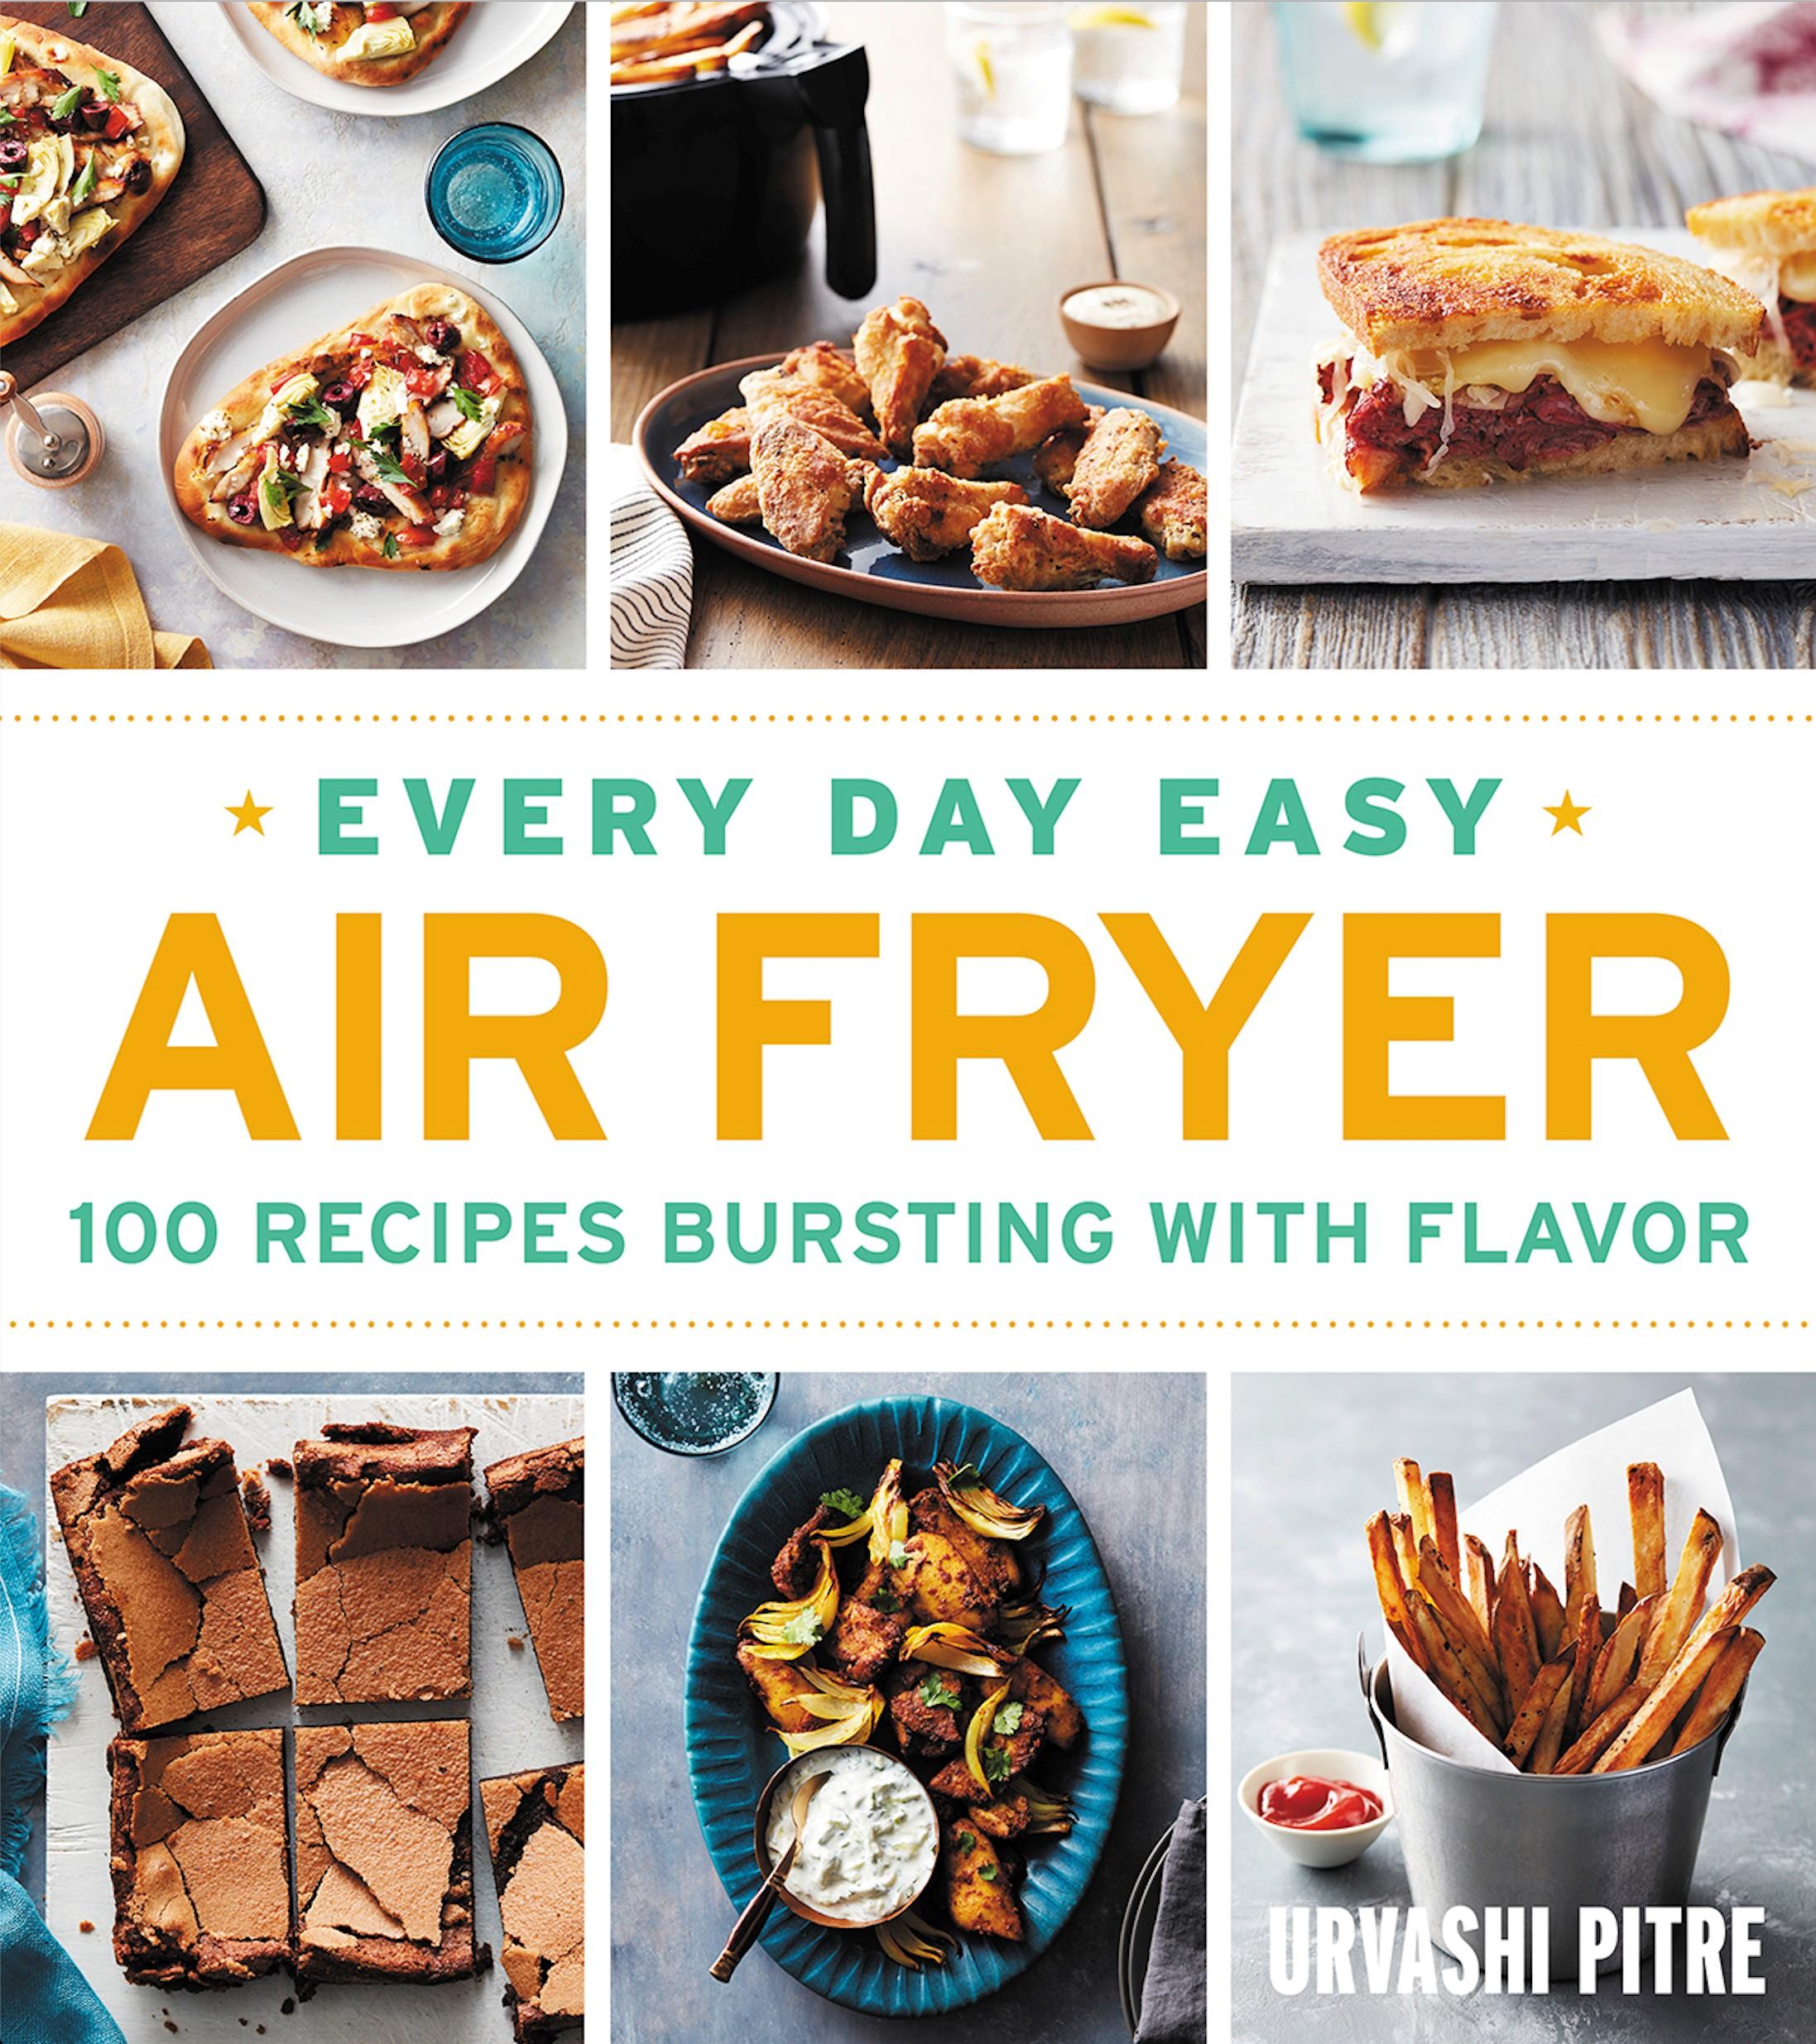 Should you buy an air fryer on Black Friday 2018? — Quartzy